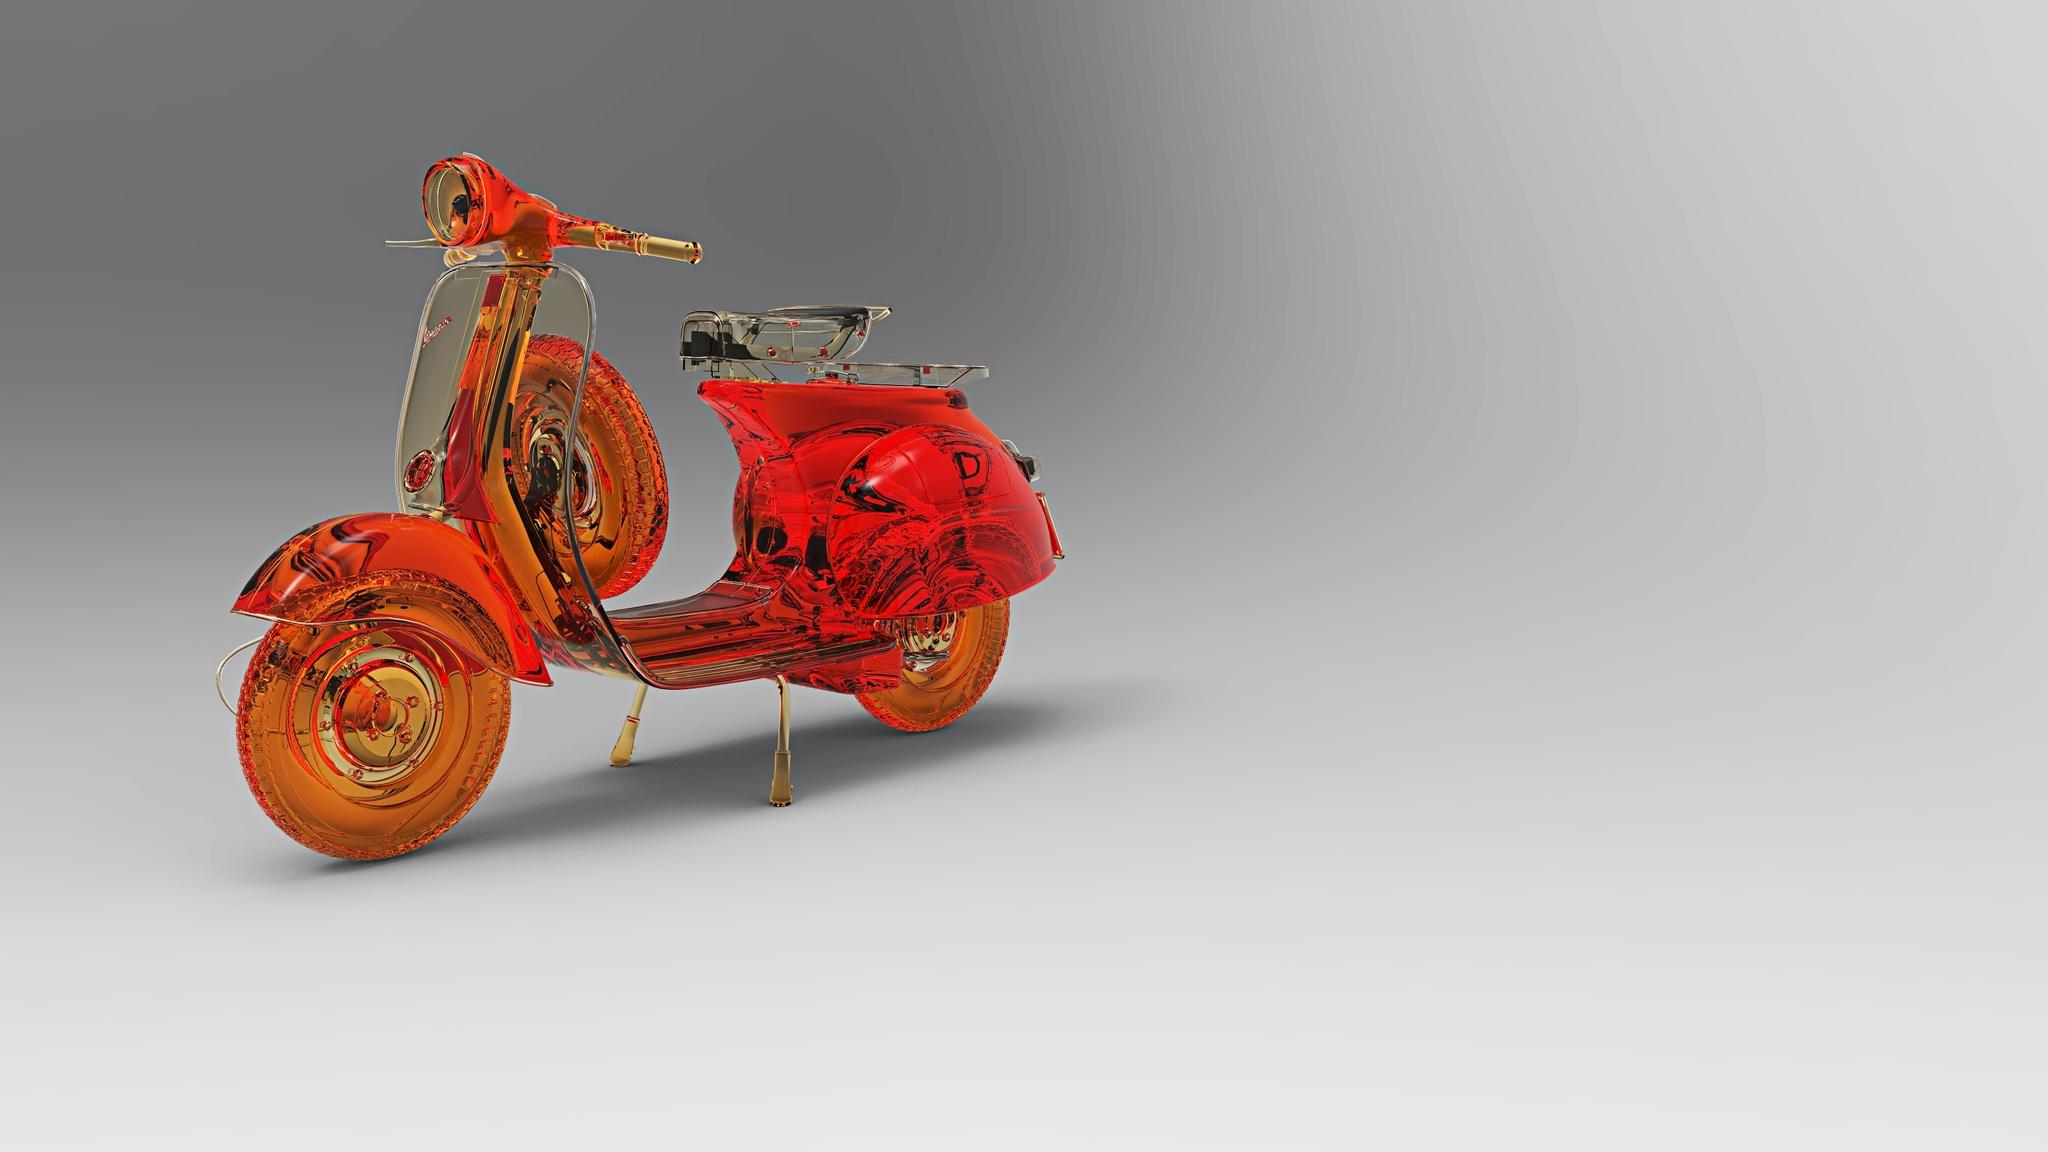 2048x1152 vespa scooter abstract art 2048x1152 resolution hd 4k